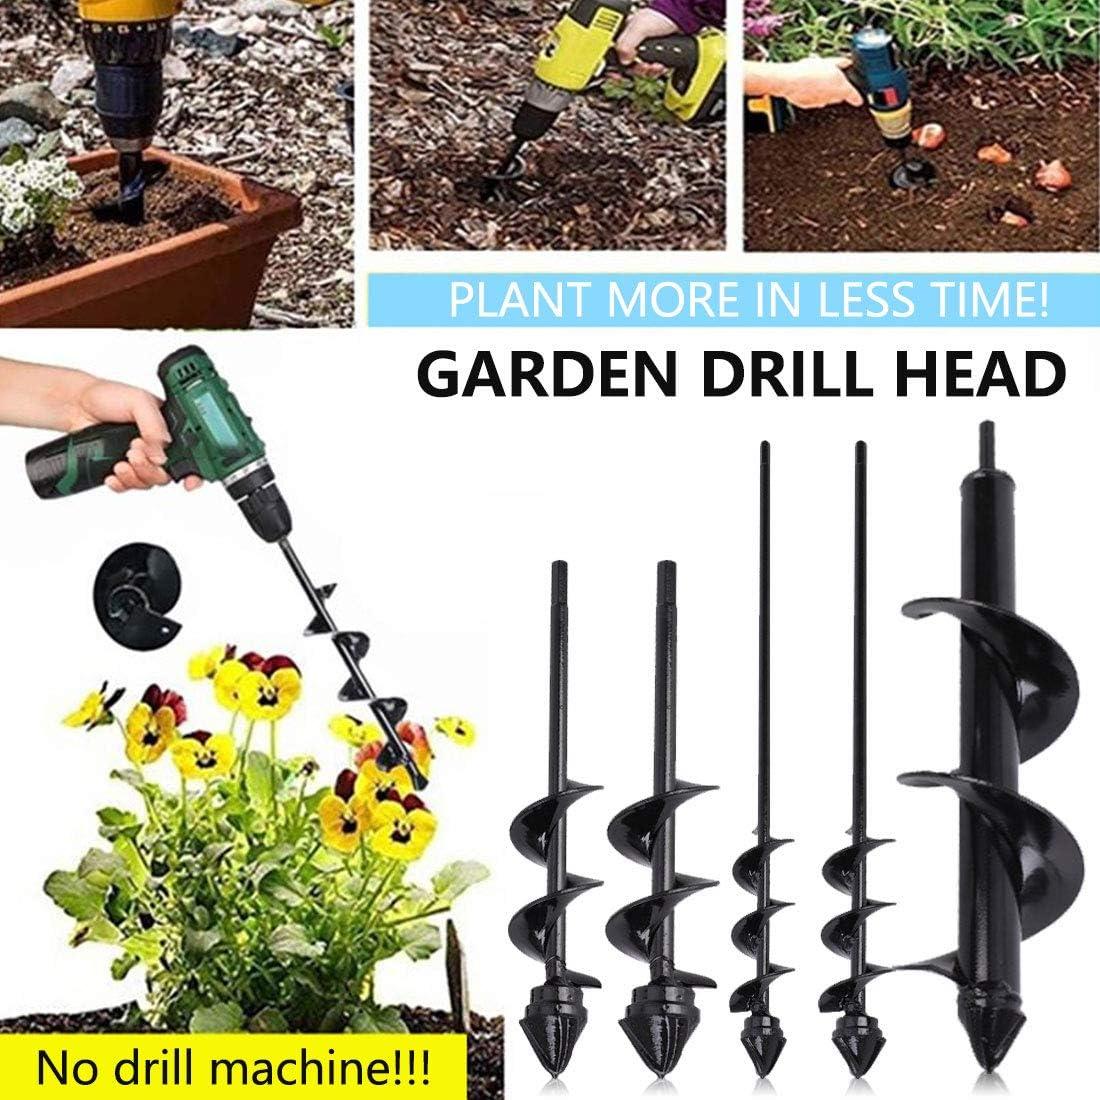 Umbrella Post Hole Digger Bulb Plant Auger Garden Drill,Garden Planter Bulb Auger Drill Bit Garden Cultivator Hand Drill Digger Auger Rust-Proof Rapid Planter